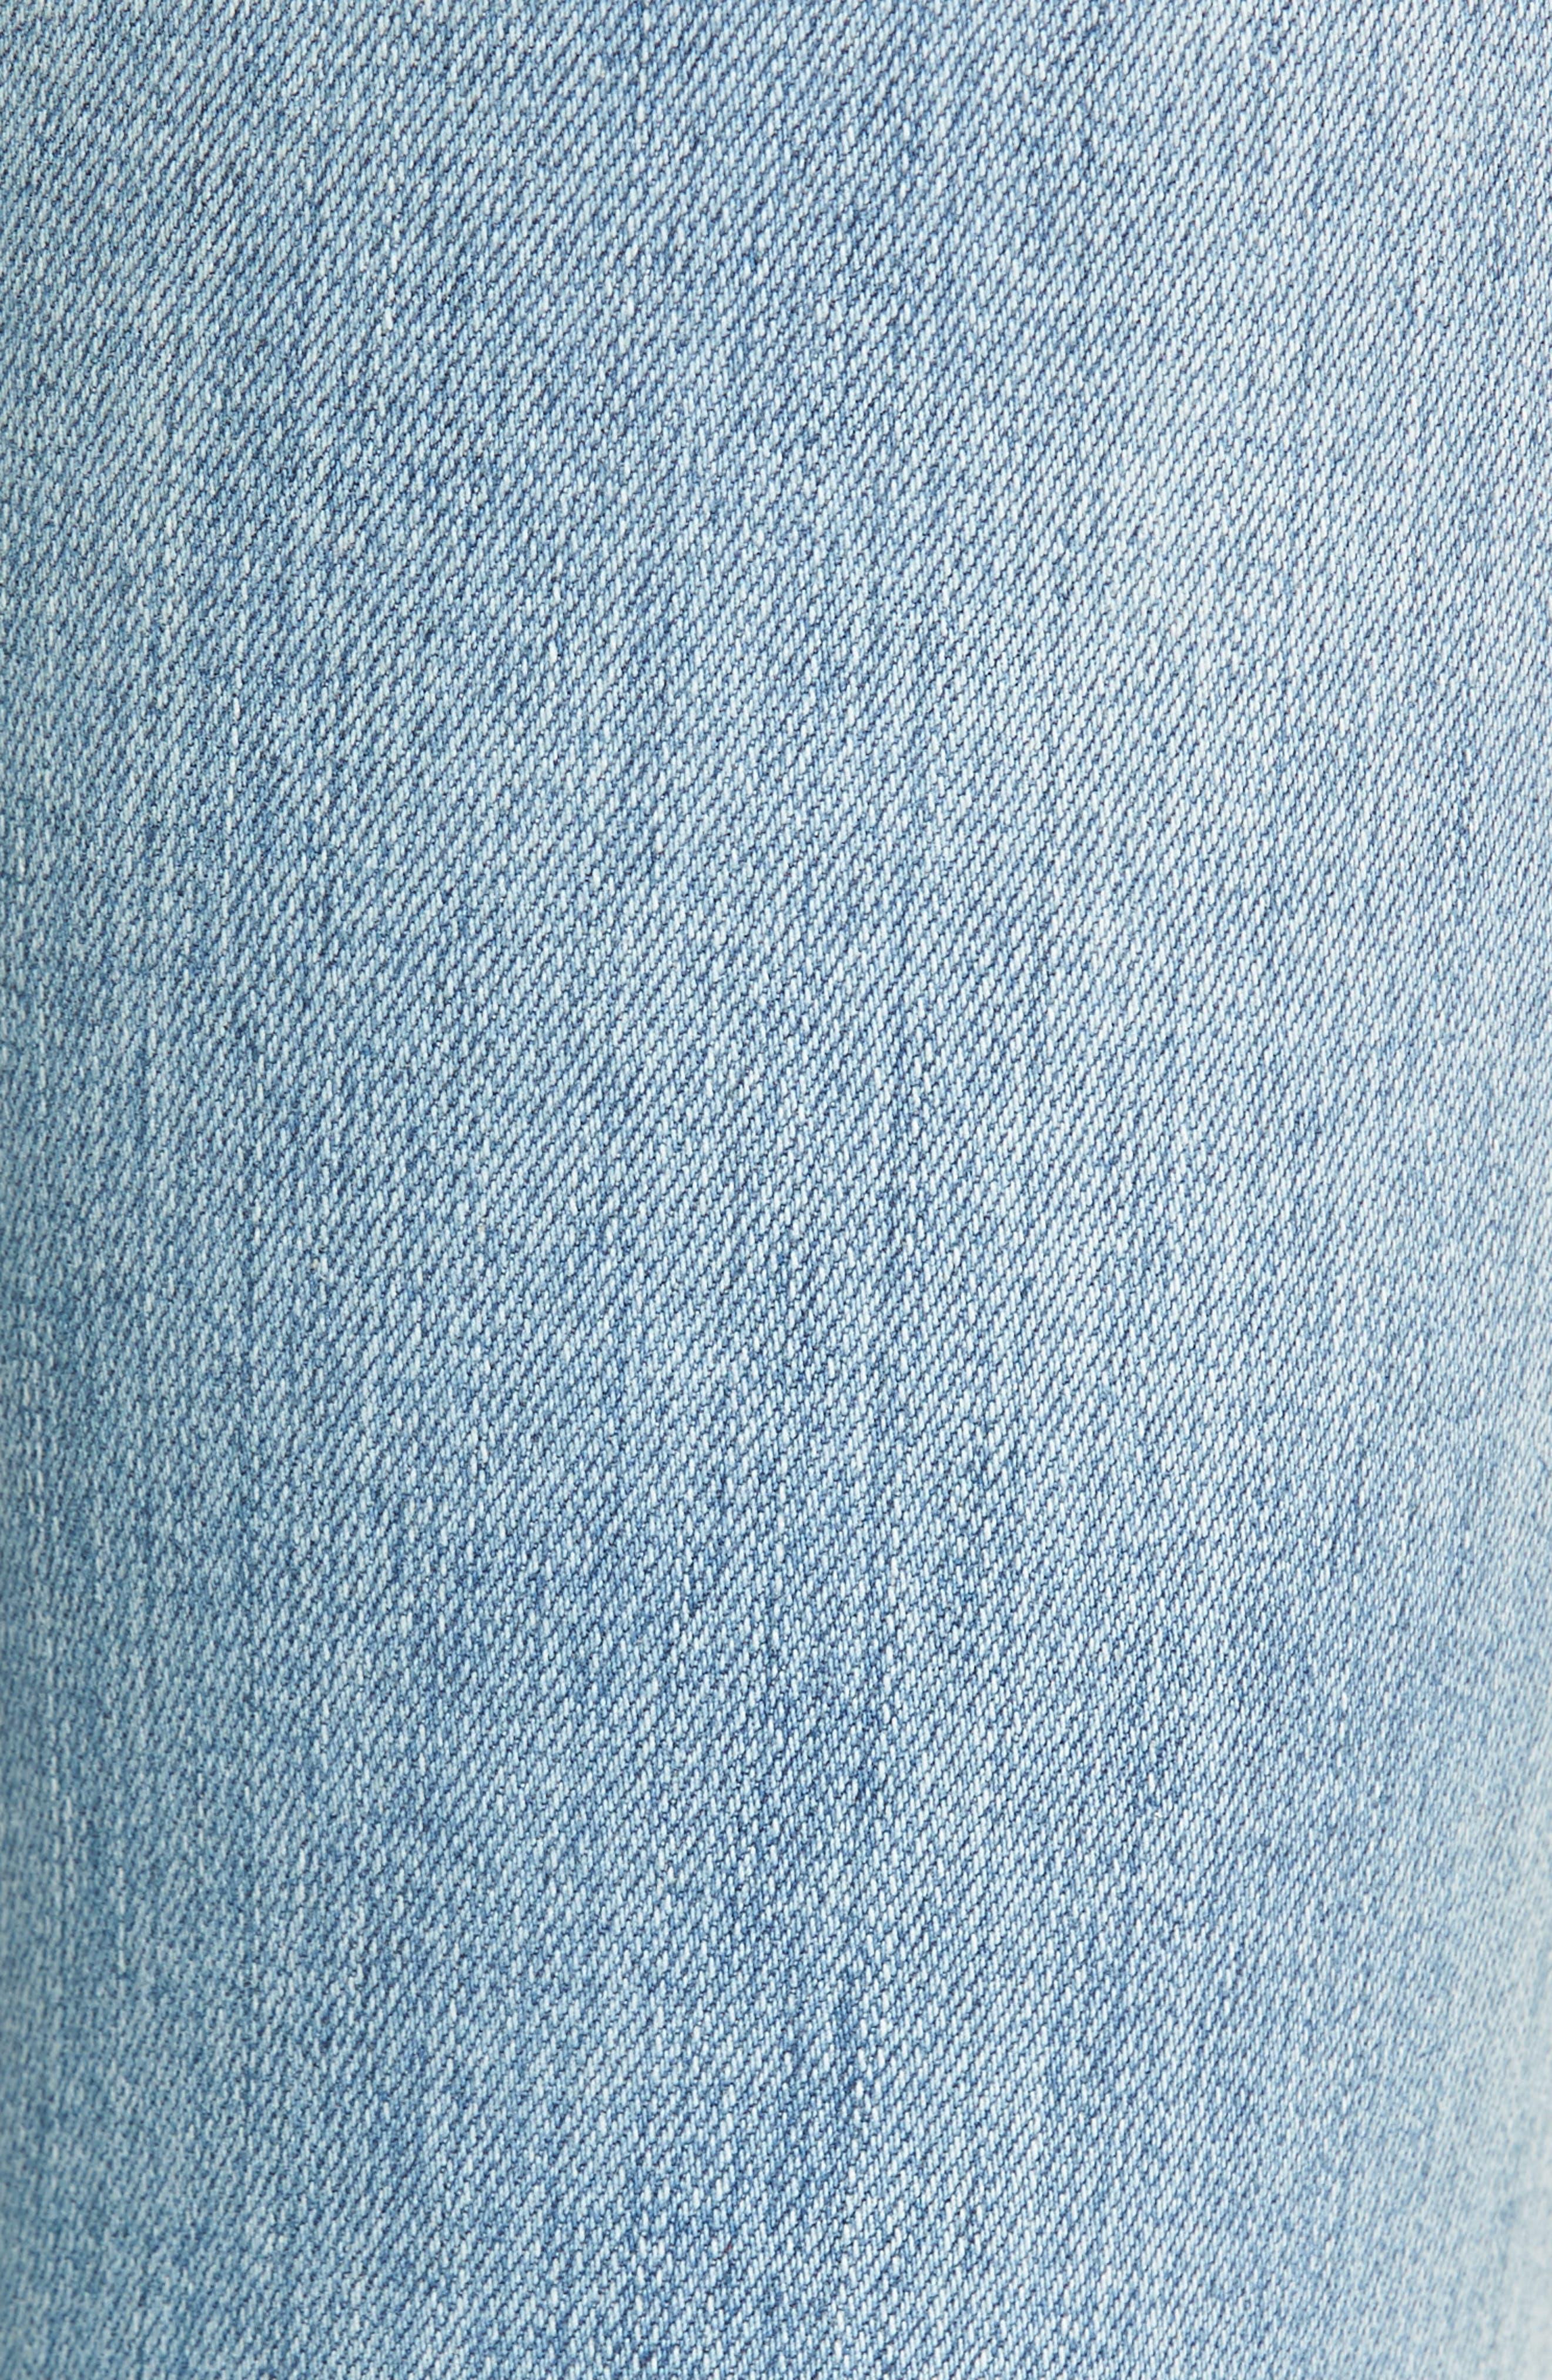 Mile High Super Skinny Jeans,                             Alternate thumbnail 6, color,